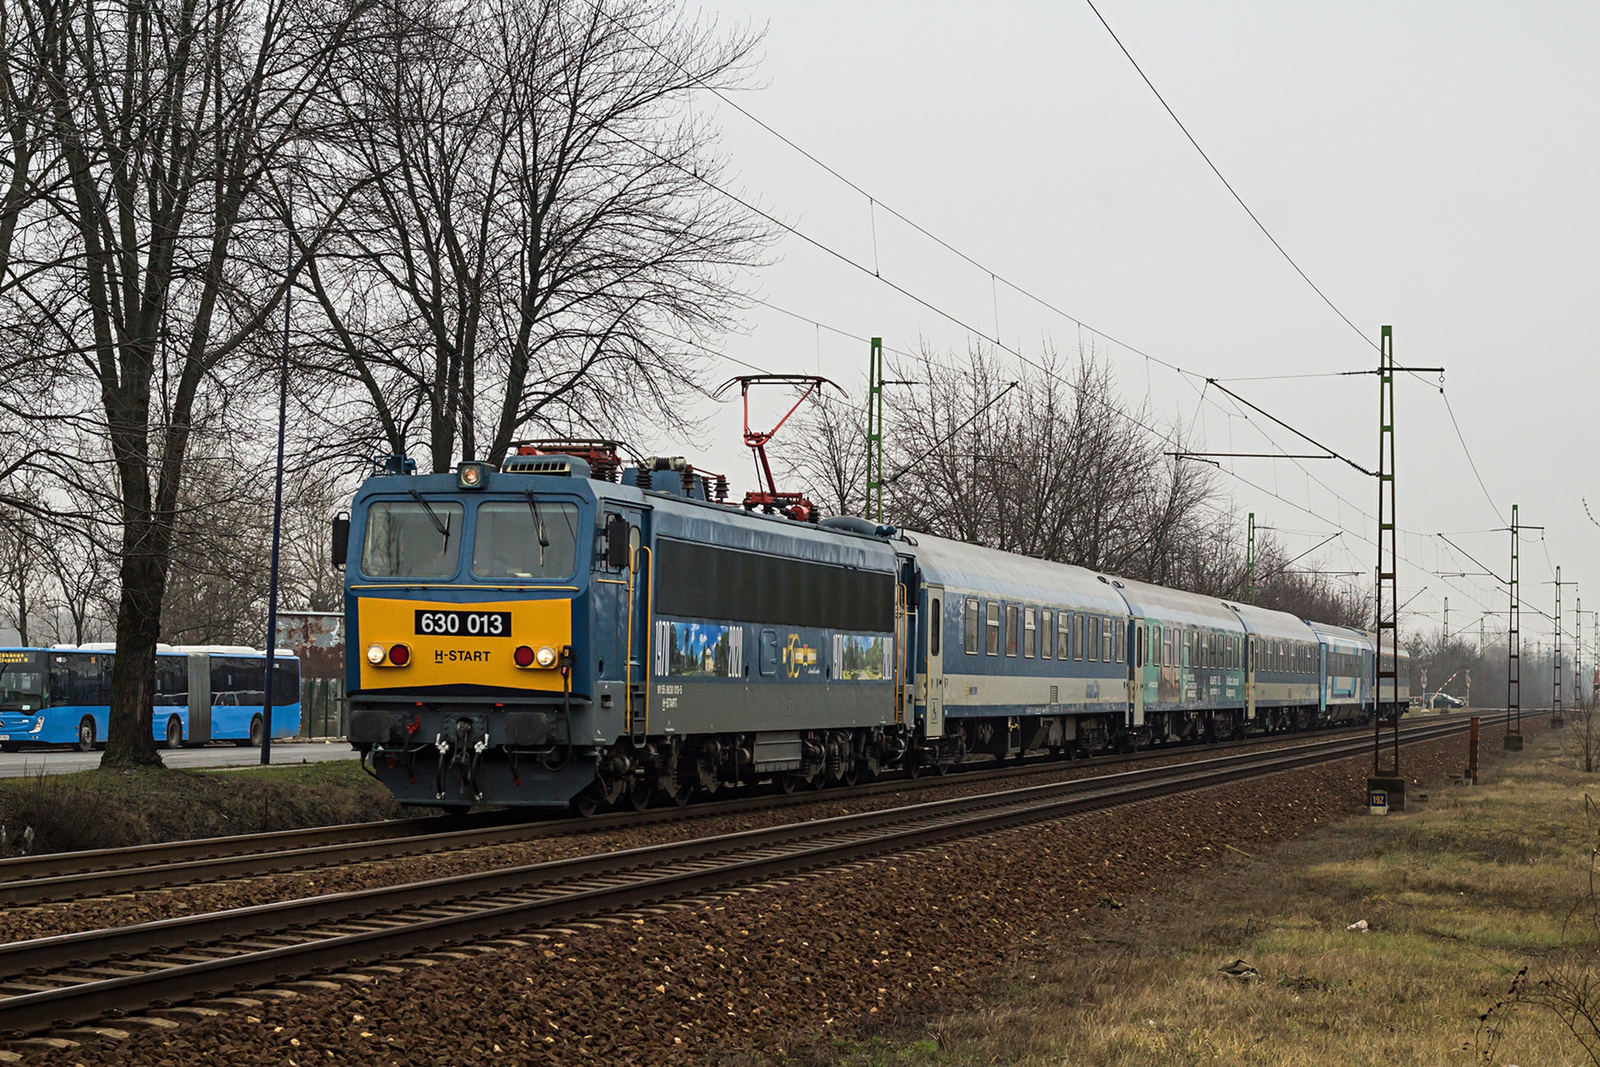 630 013 Ferihegy (2021.02.02)